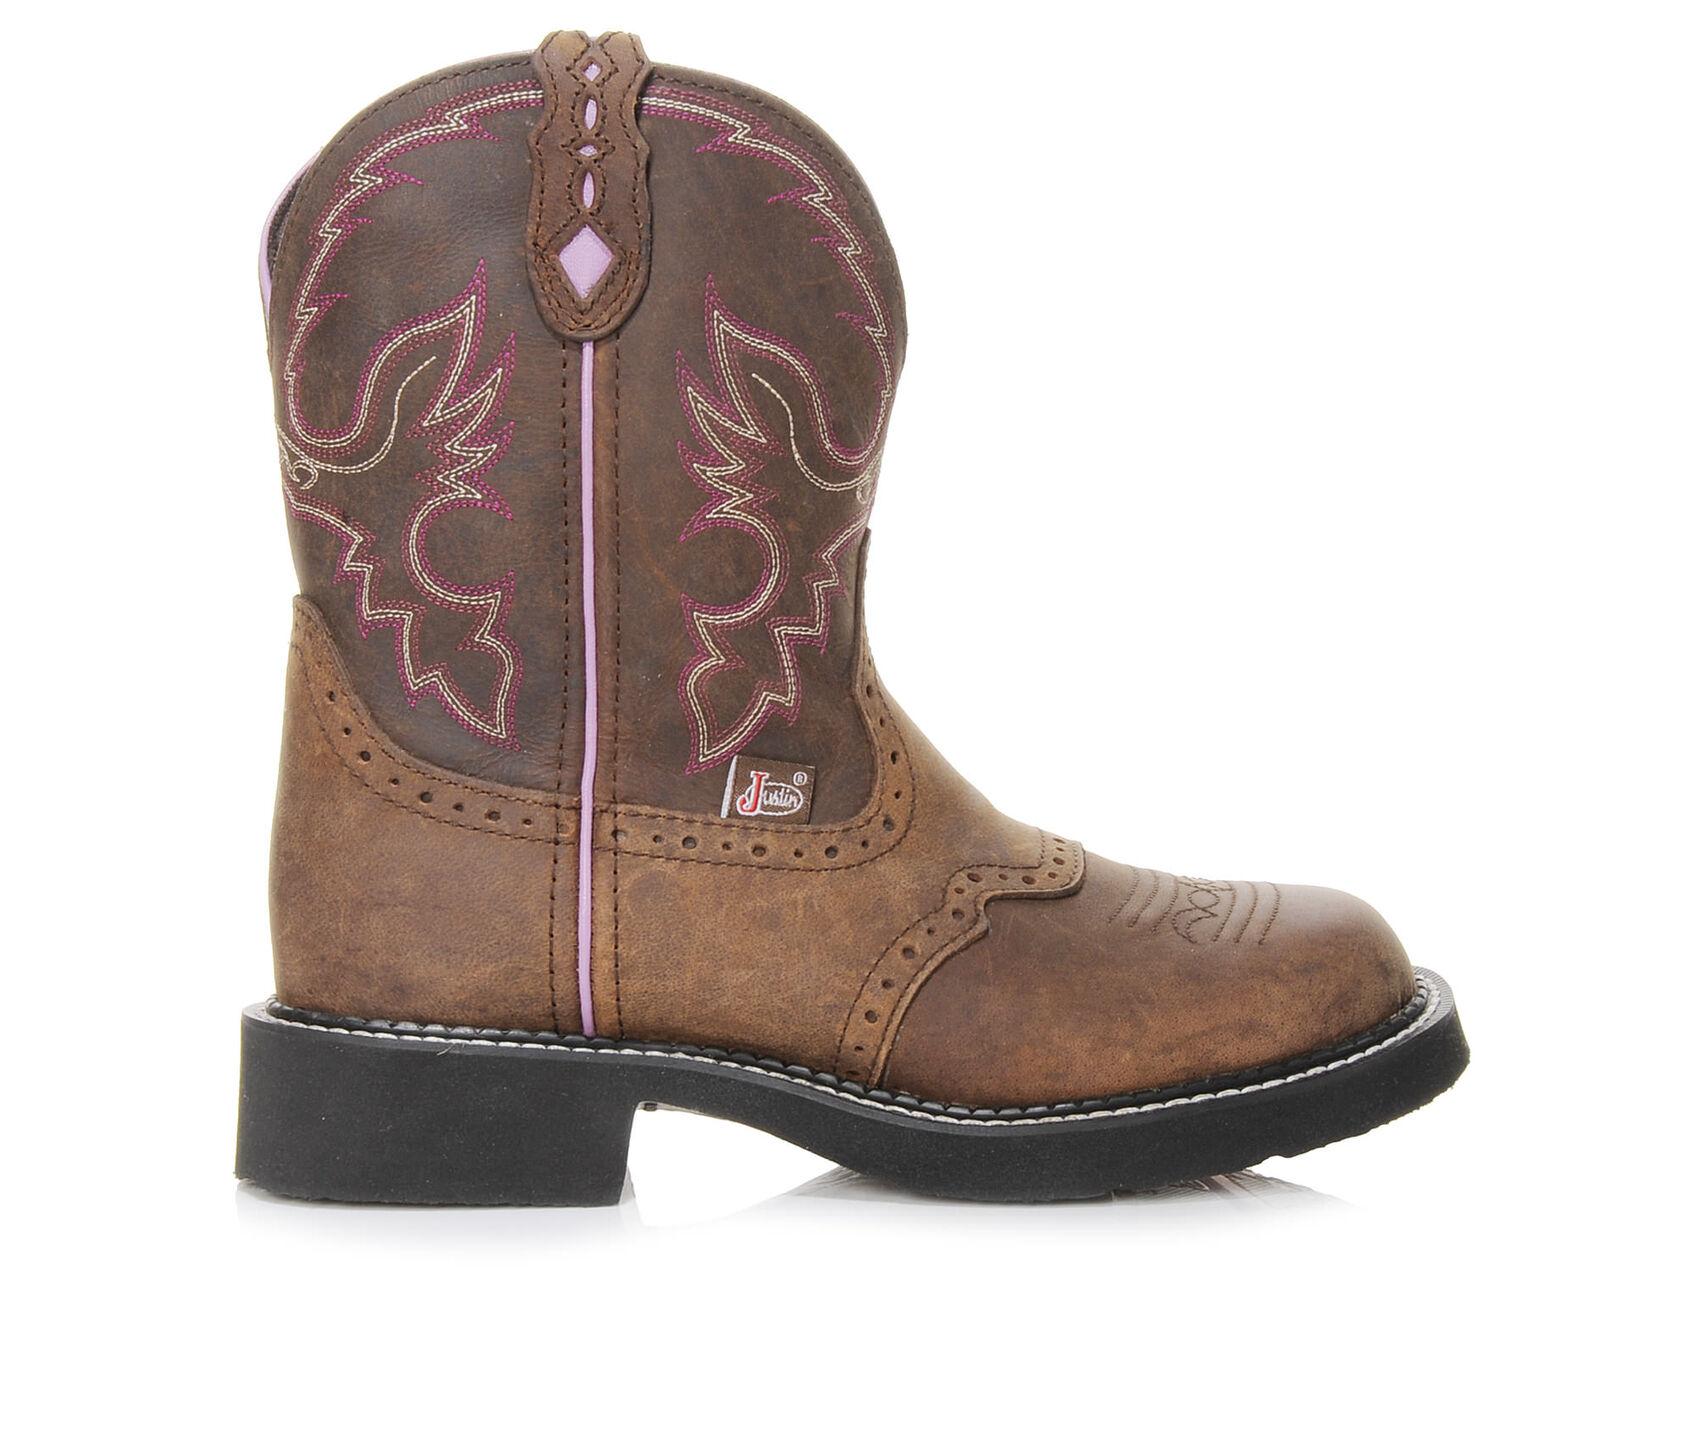 a34d5b70af3 Women's Justin Boots Gypsy 8